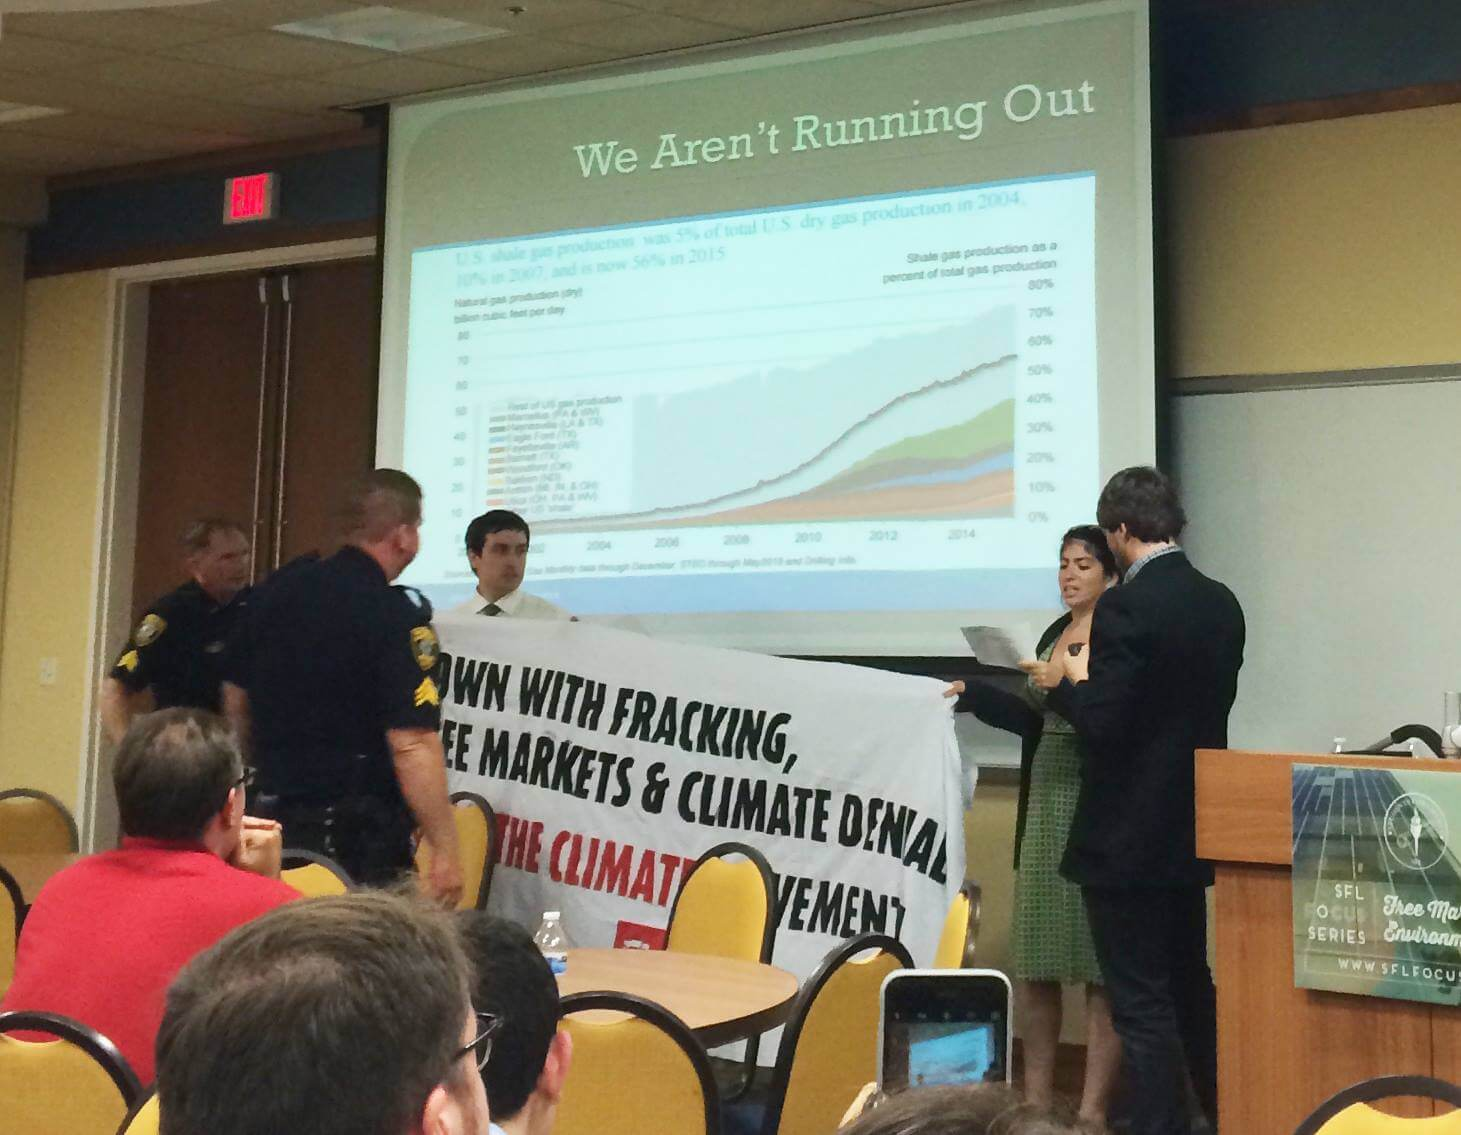 FGCU economics conference interrupted by anti-fracking protestors